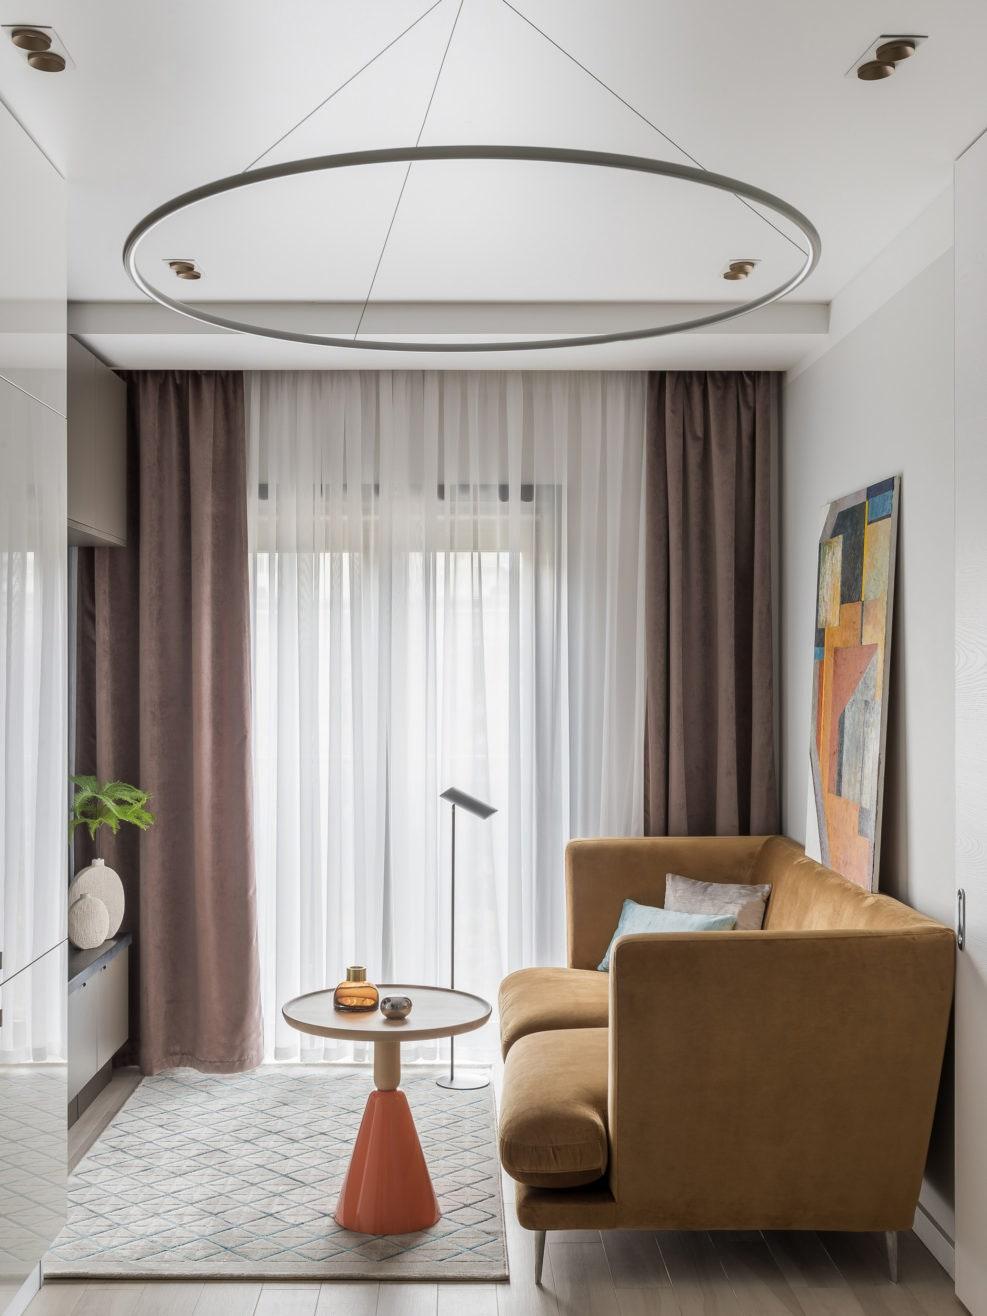 30 . .  Gray Cardinal            Barcelona Design    Amikovry.ru    .   .   .